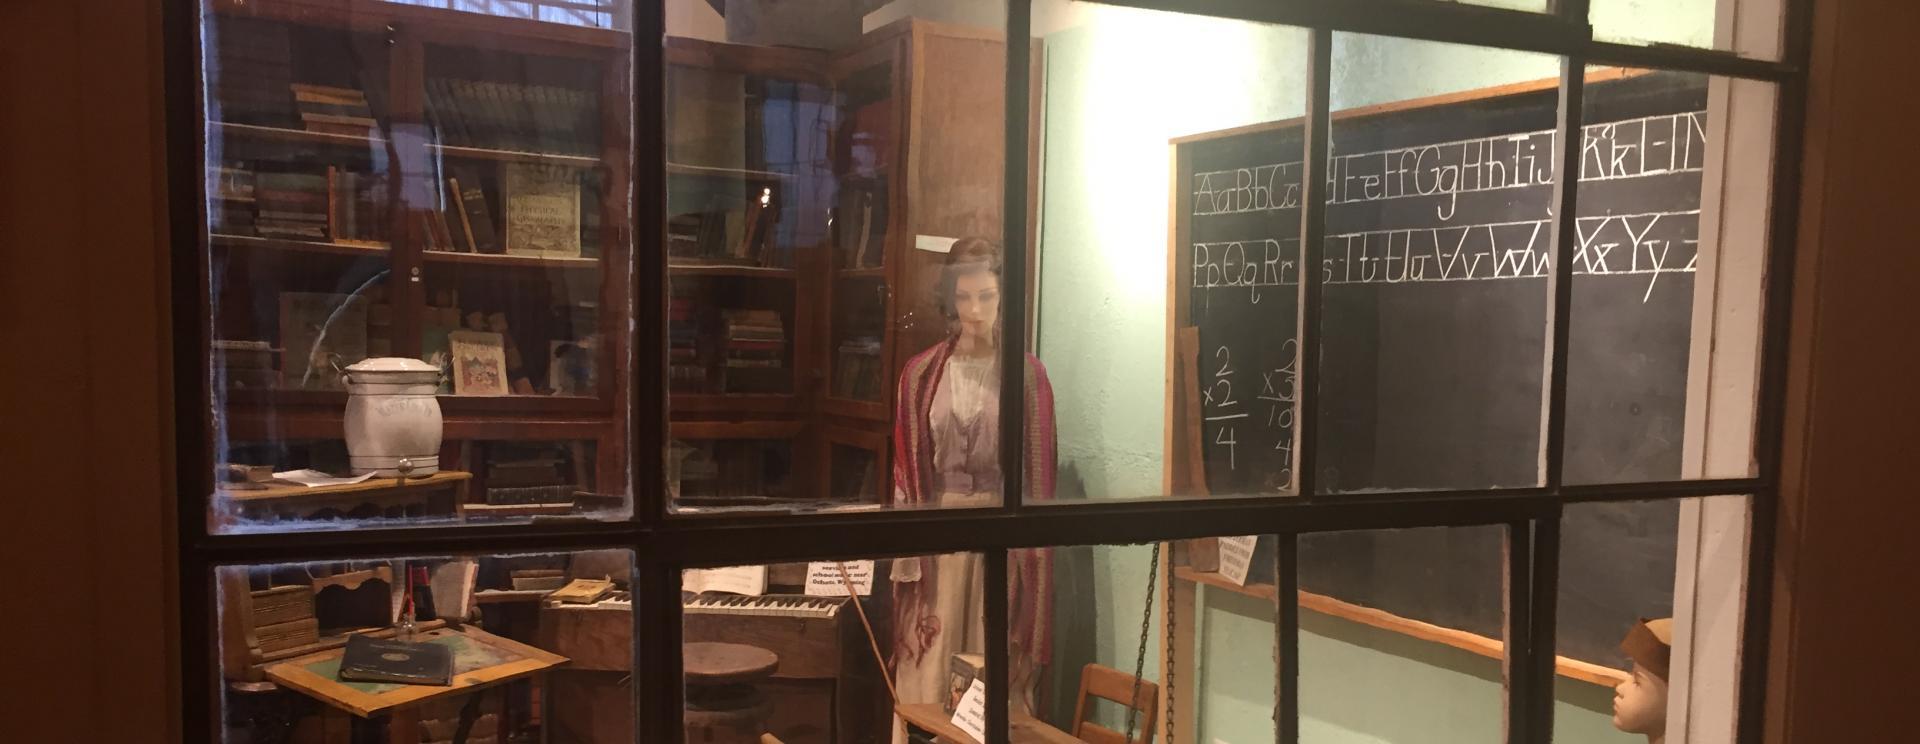 Crook County Museum & Art Gallery